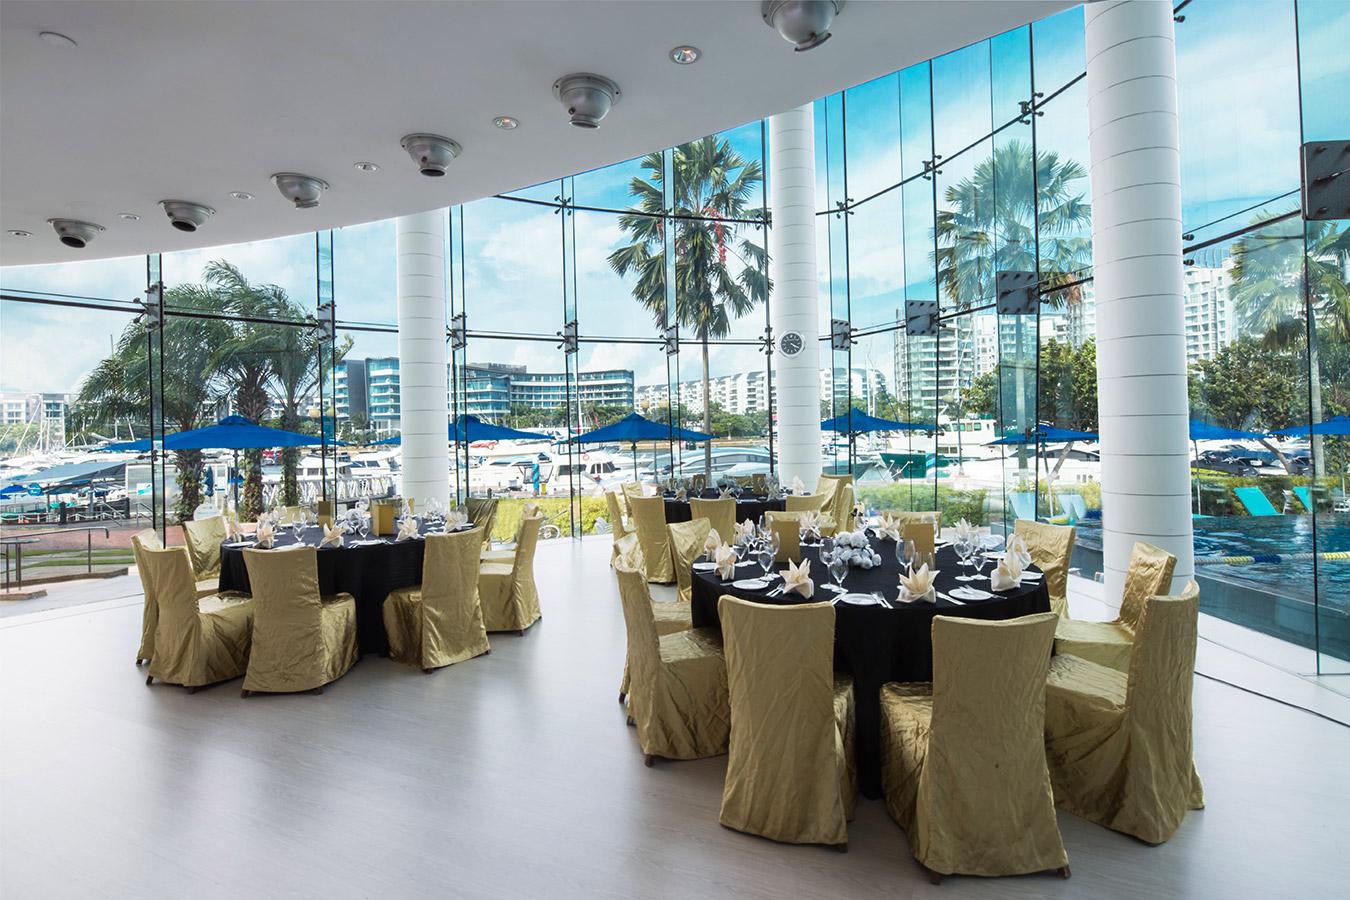 One°15 Marina Sentosa Cove Club